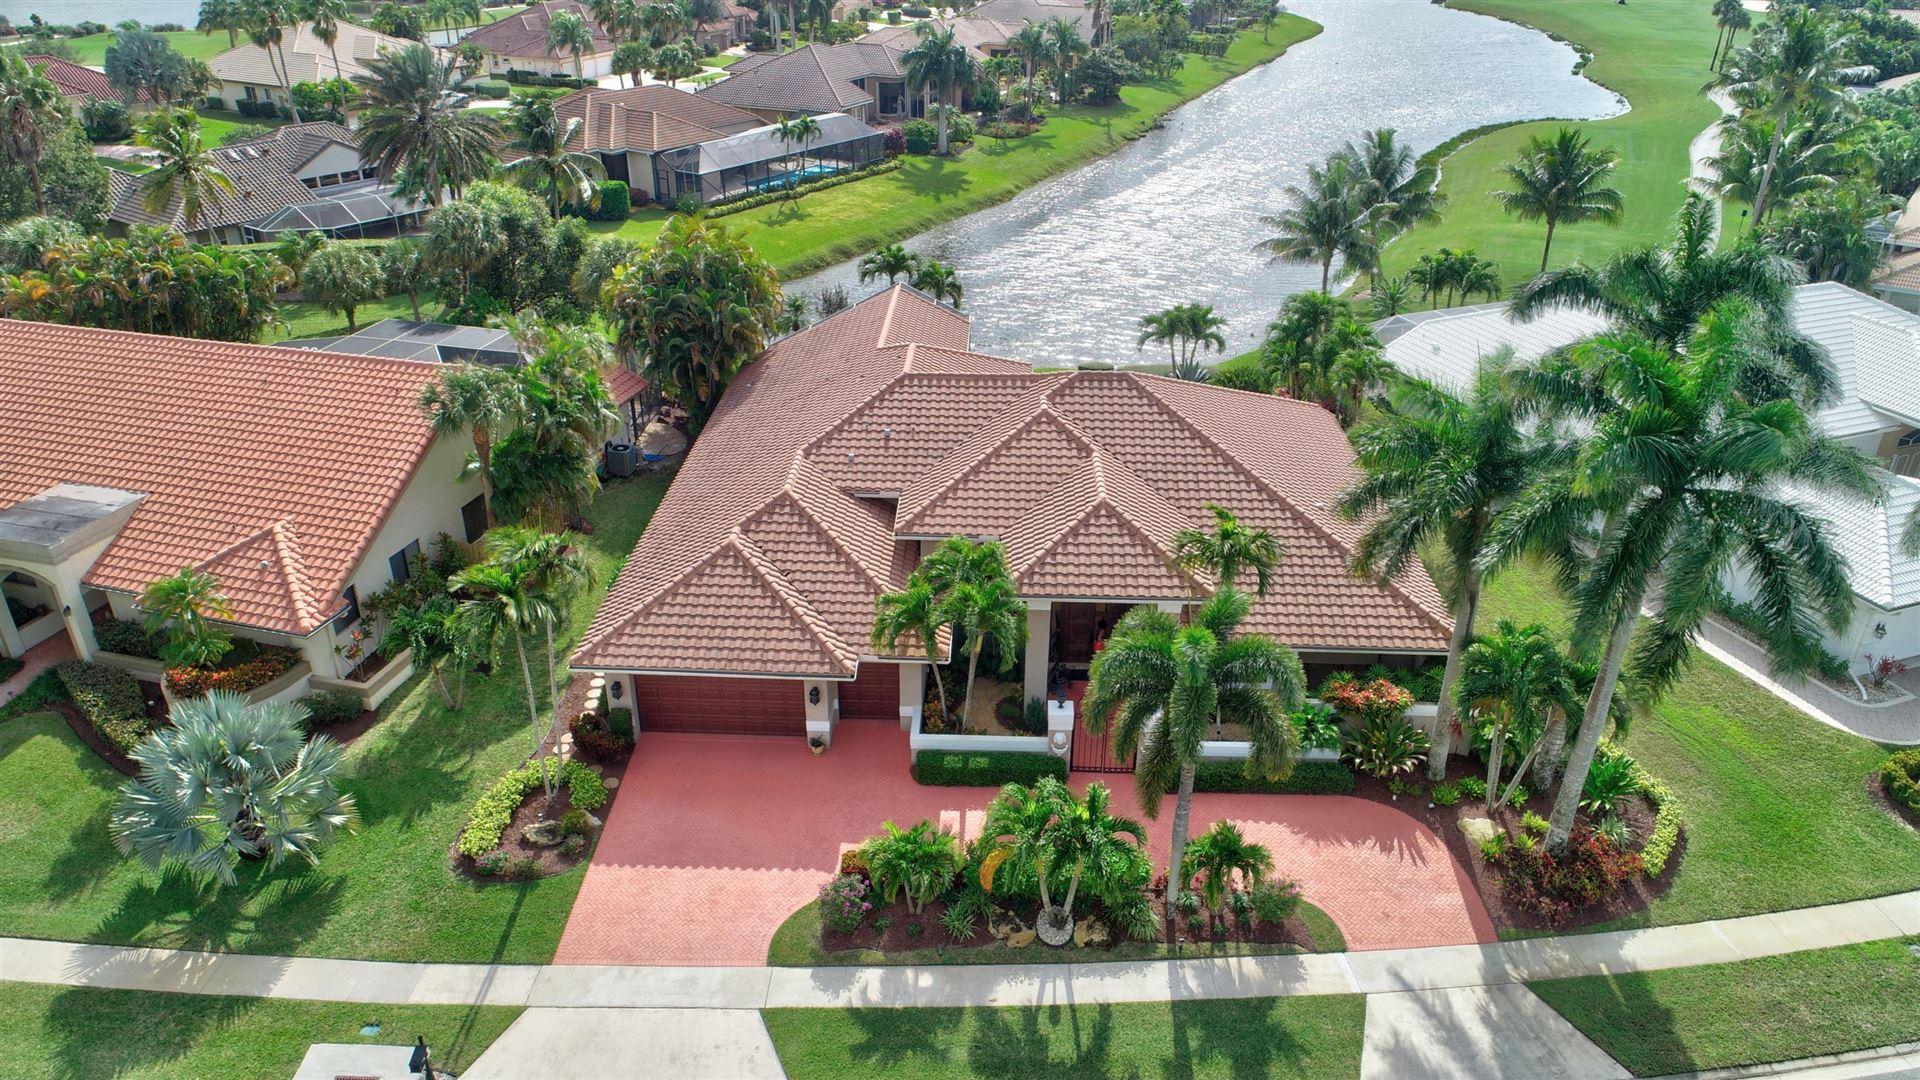 10547 Stonebridge Boulevard, Boca Raton, FL 33498 - #: RX-10599791